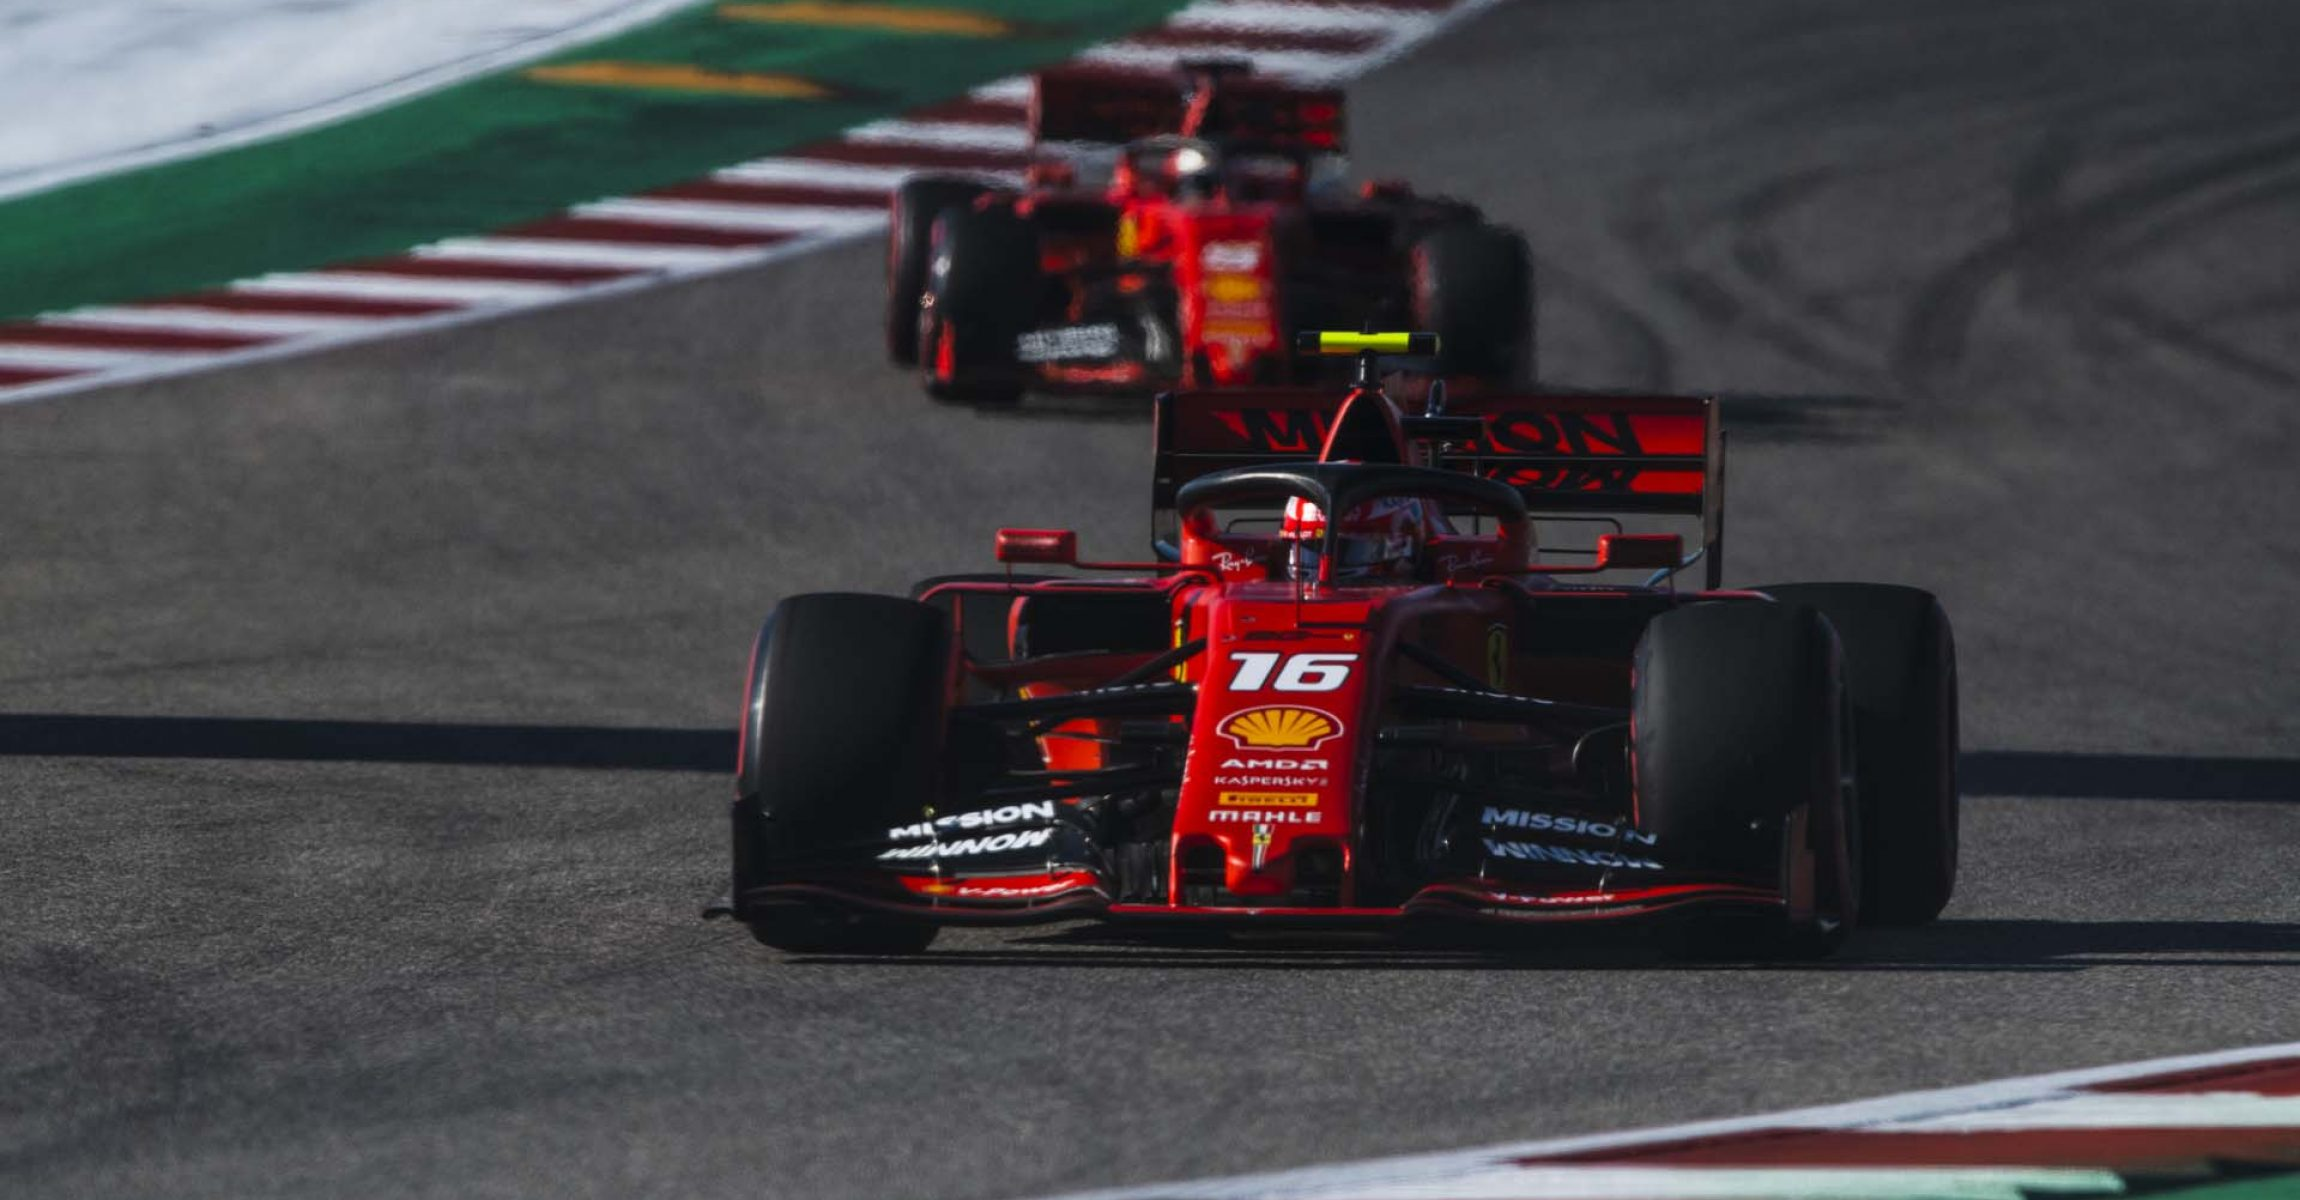 Charles Leclerc followed by Sebastian Vettel